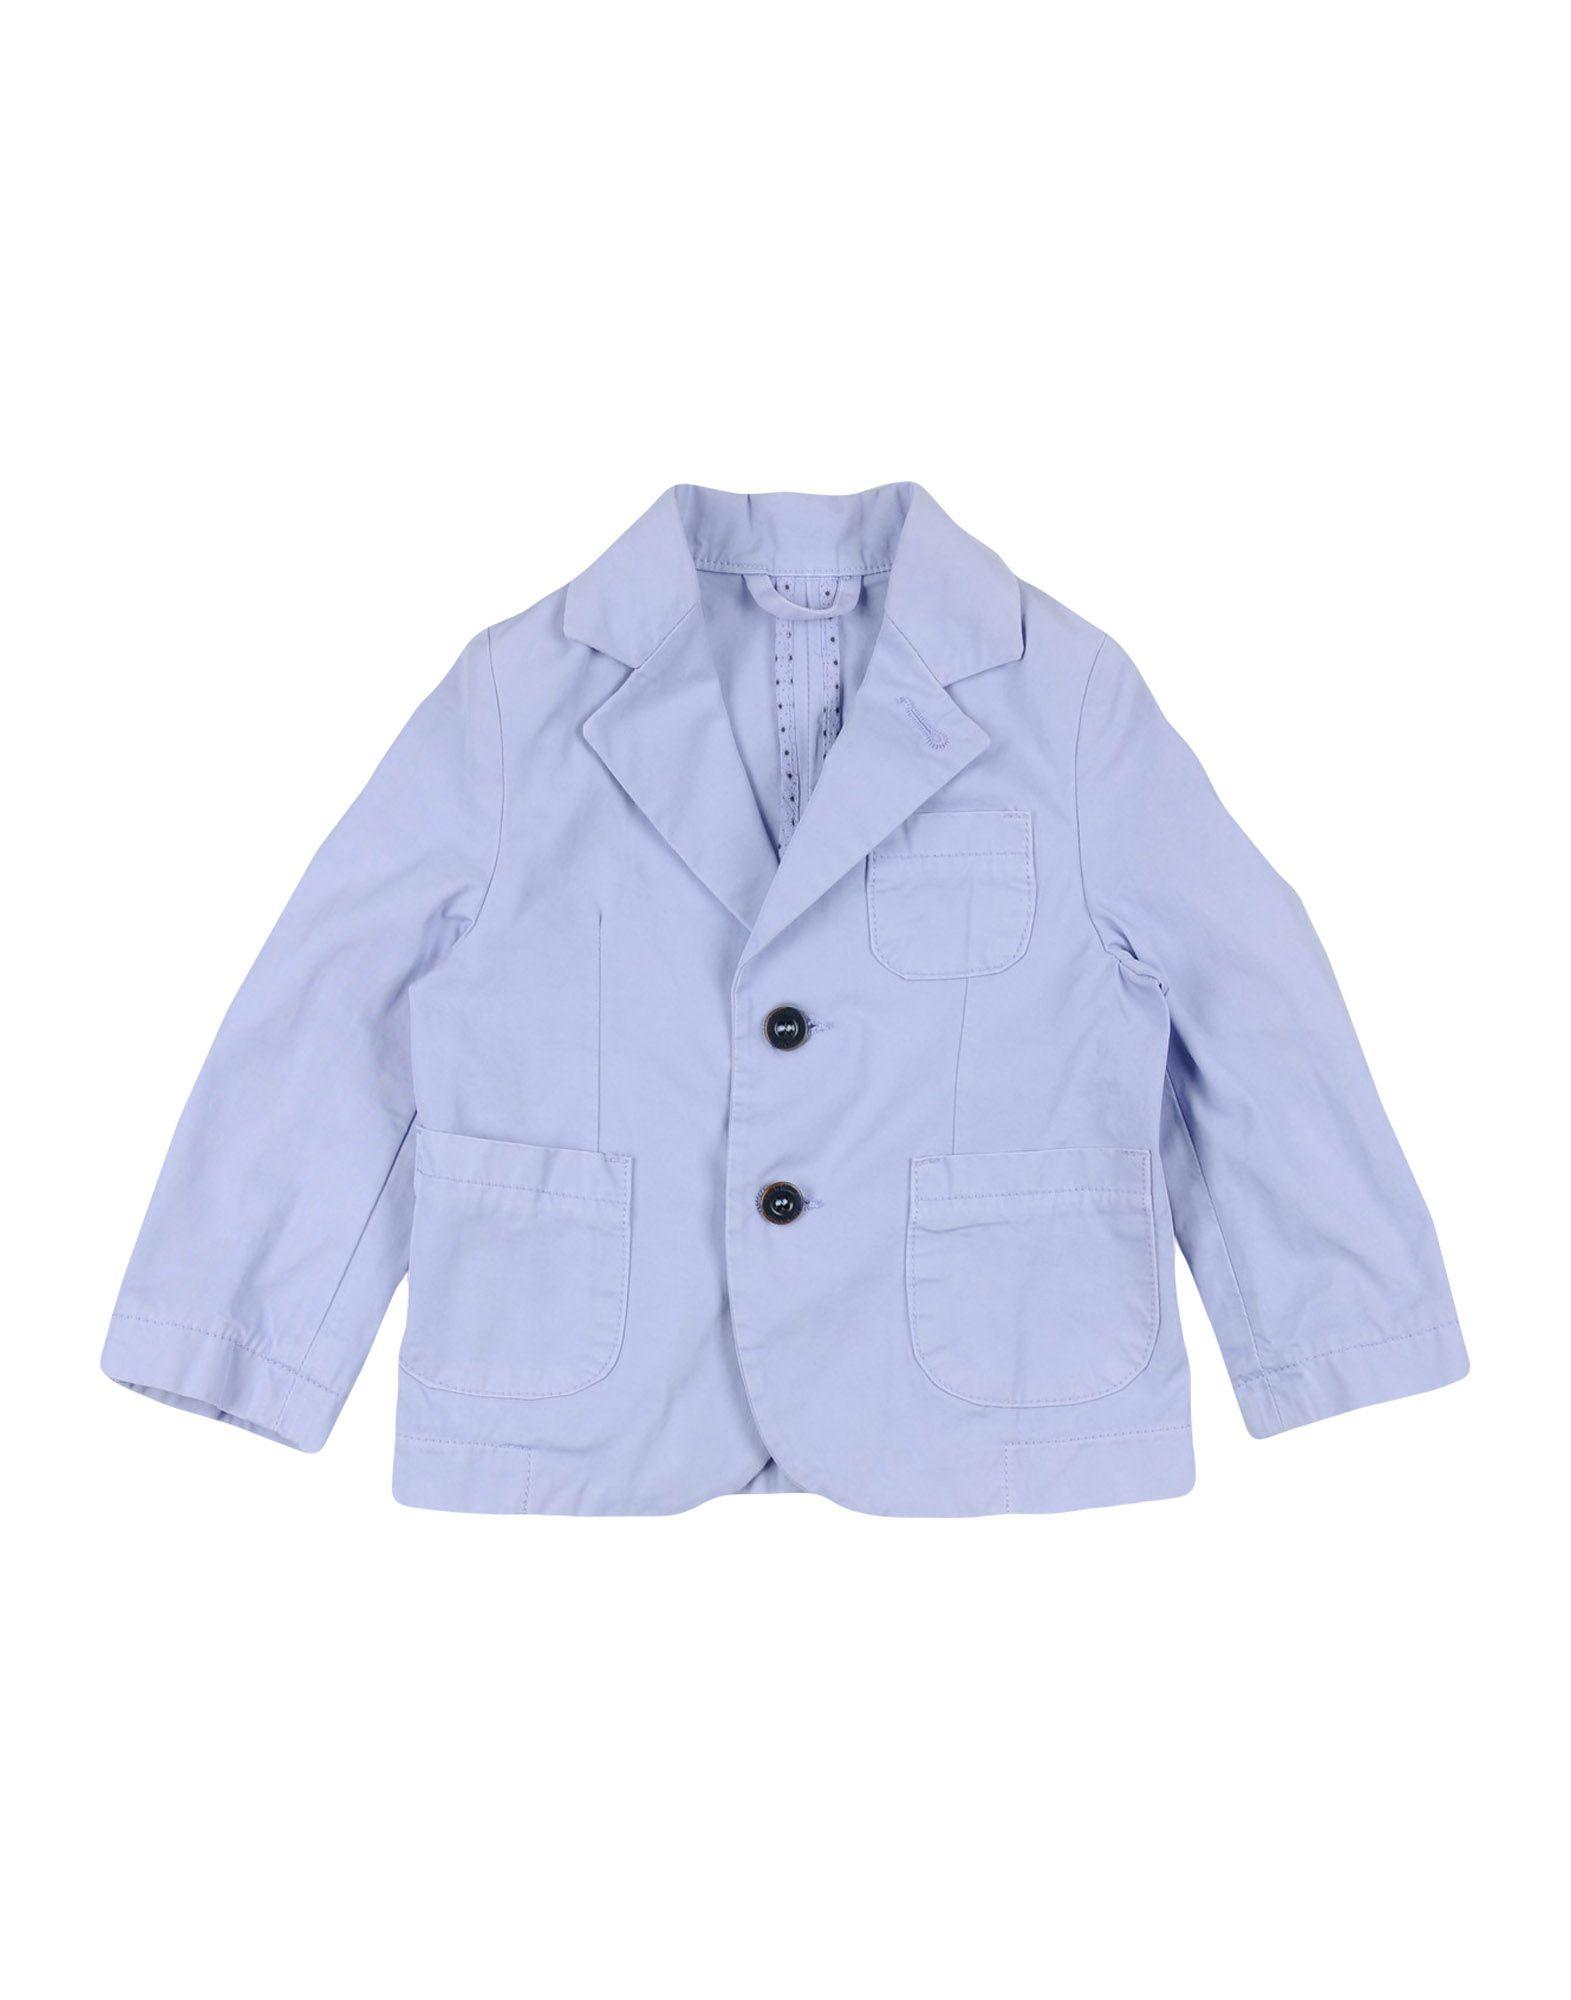 MONNALISA Blazer in Lilac